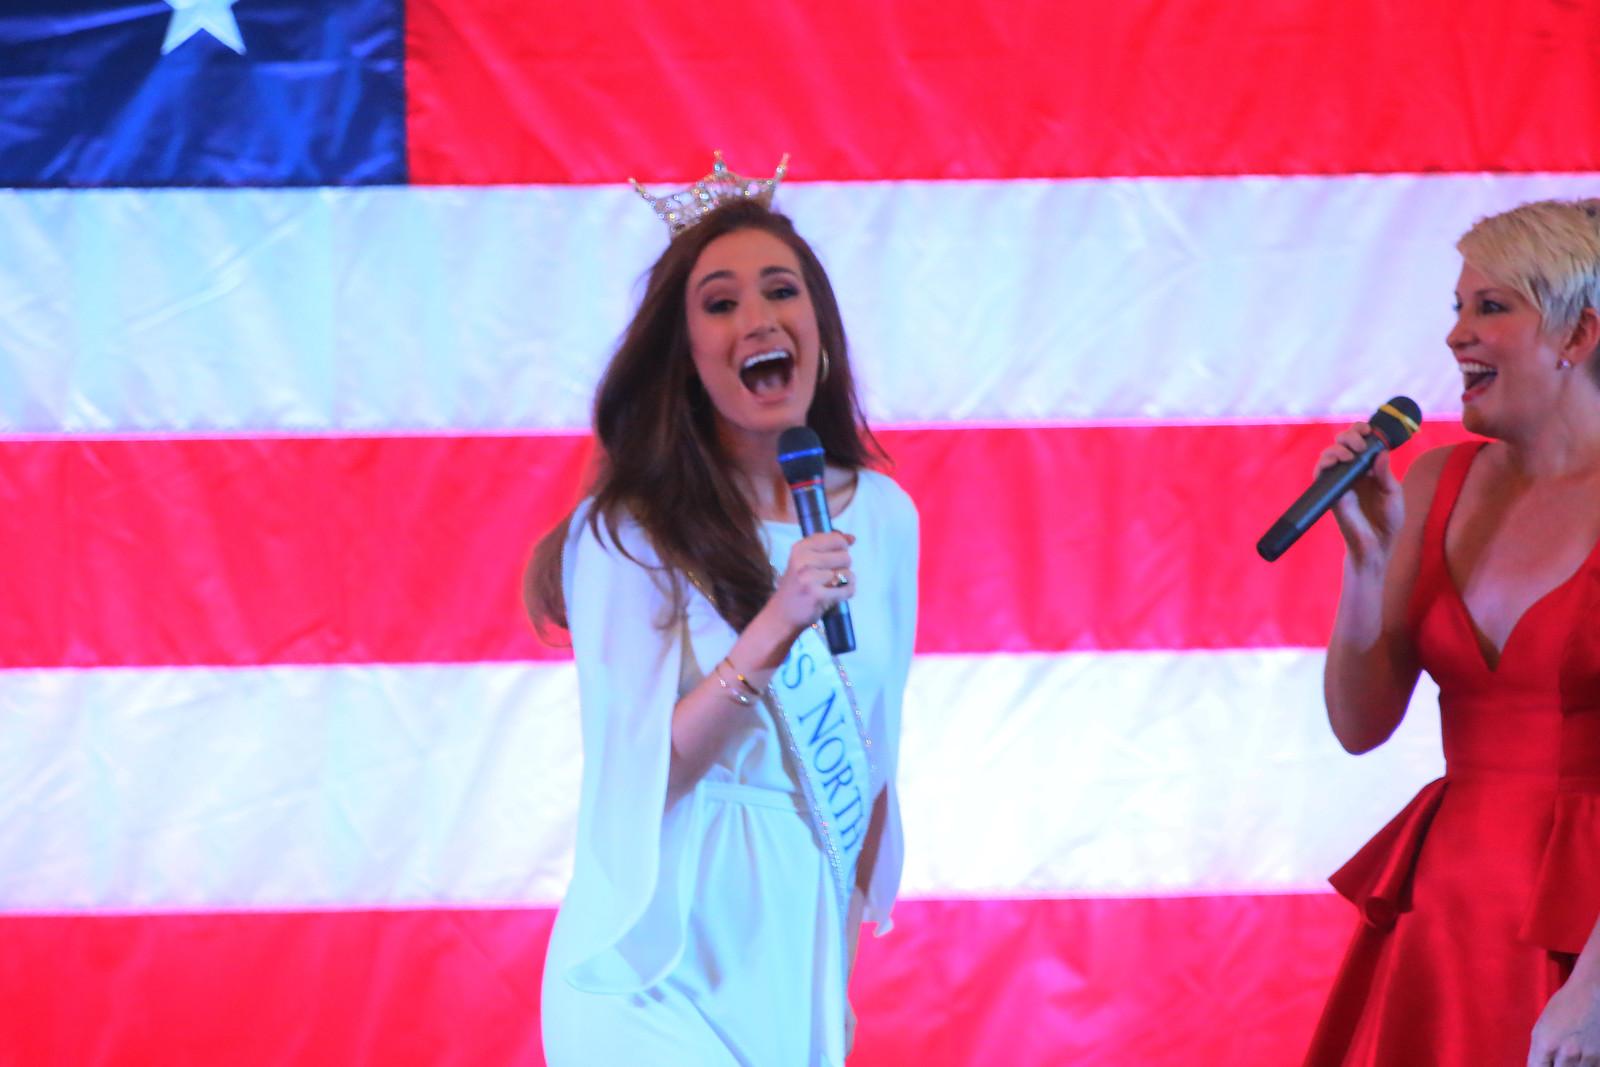 Miss North Carolina and Rachael Murray